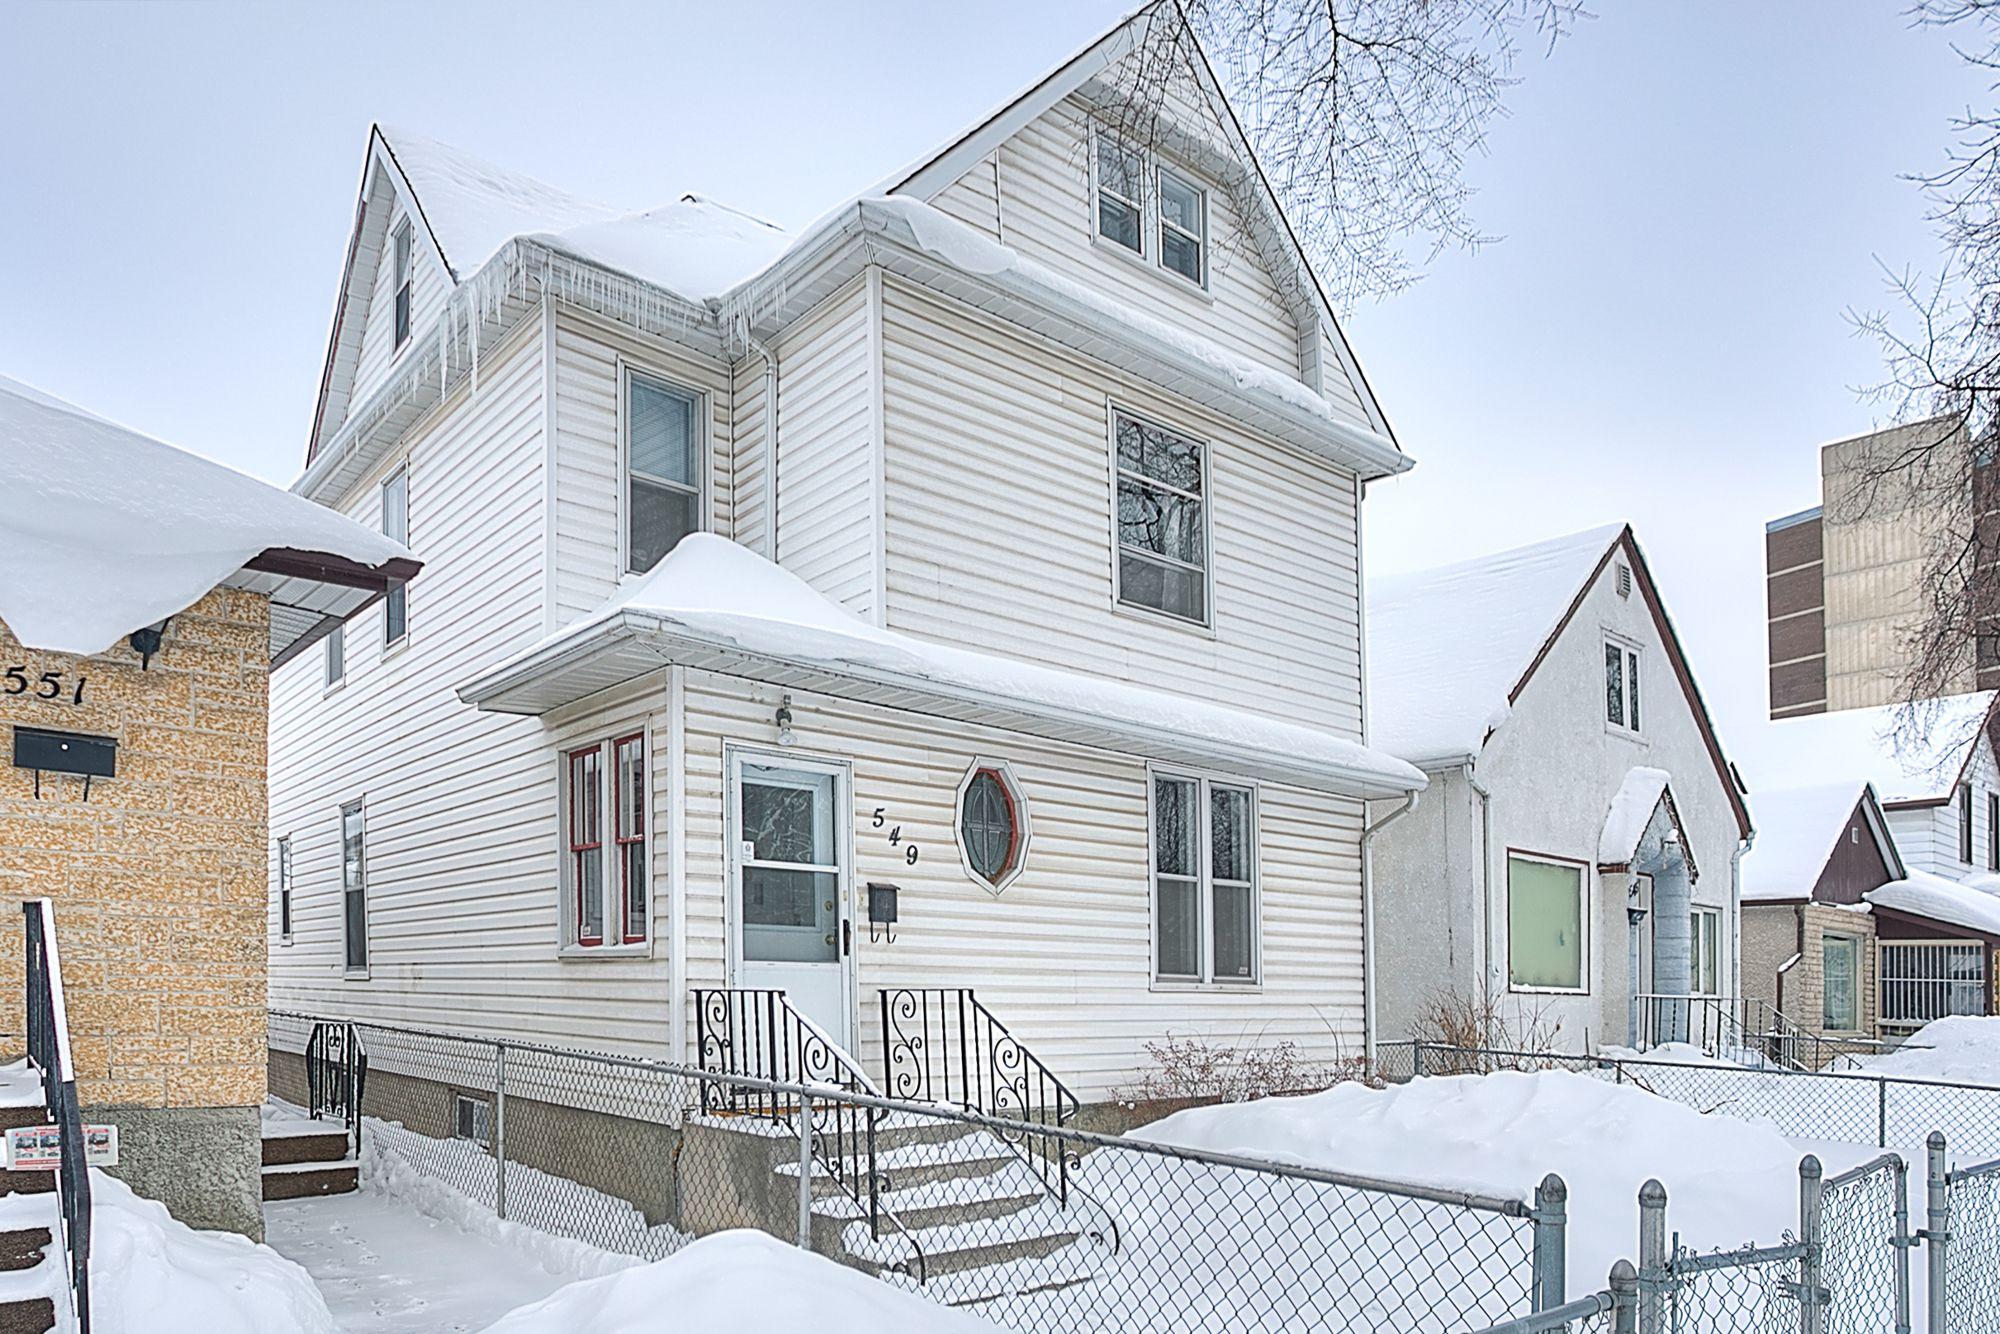 Main Photo: 549 Elgin Avenue in Winnipeg: West End Single Family Detached for sale (5A)  : MLS®# 1903292